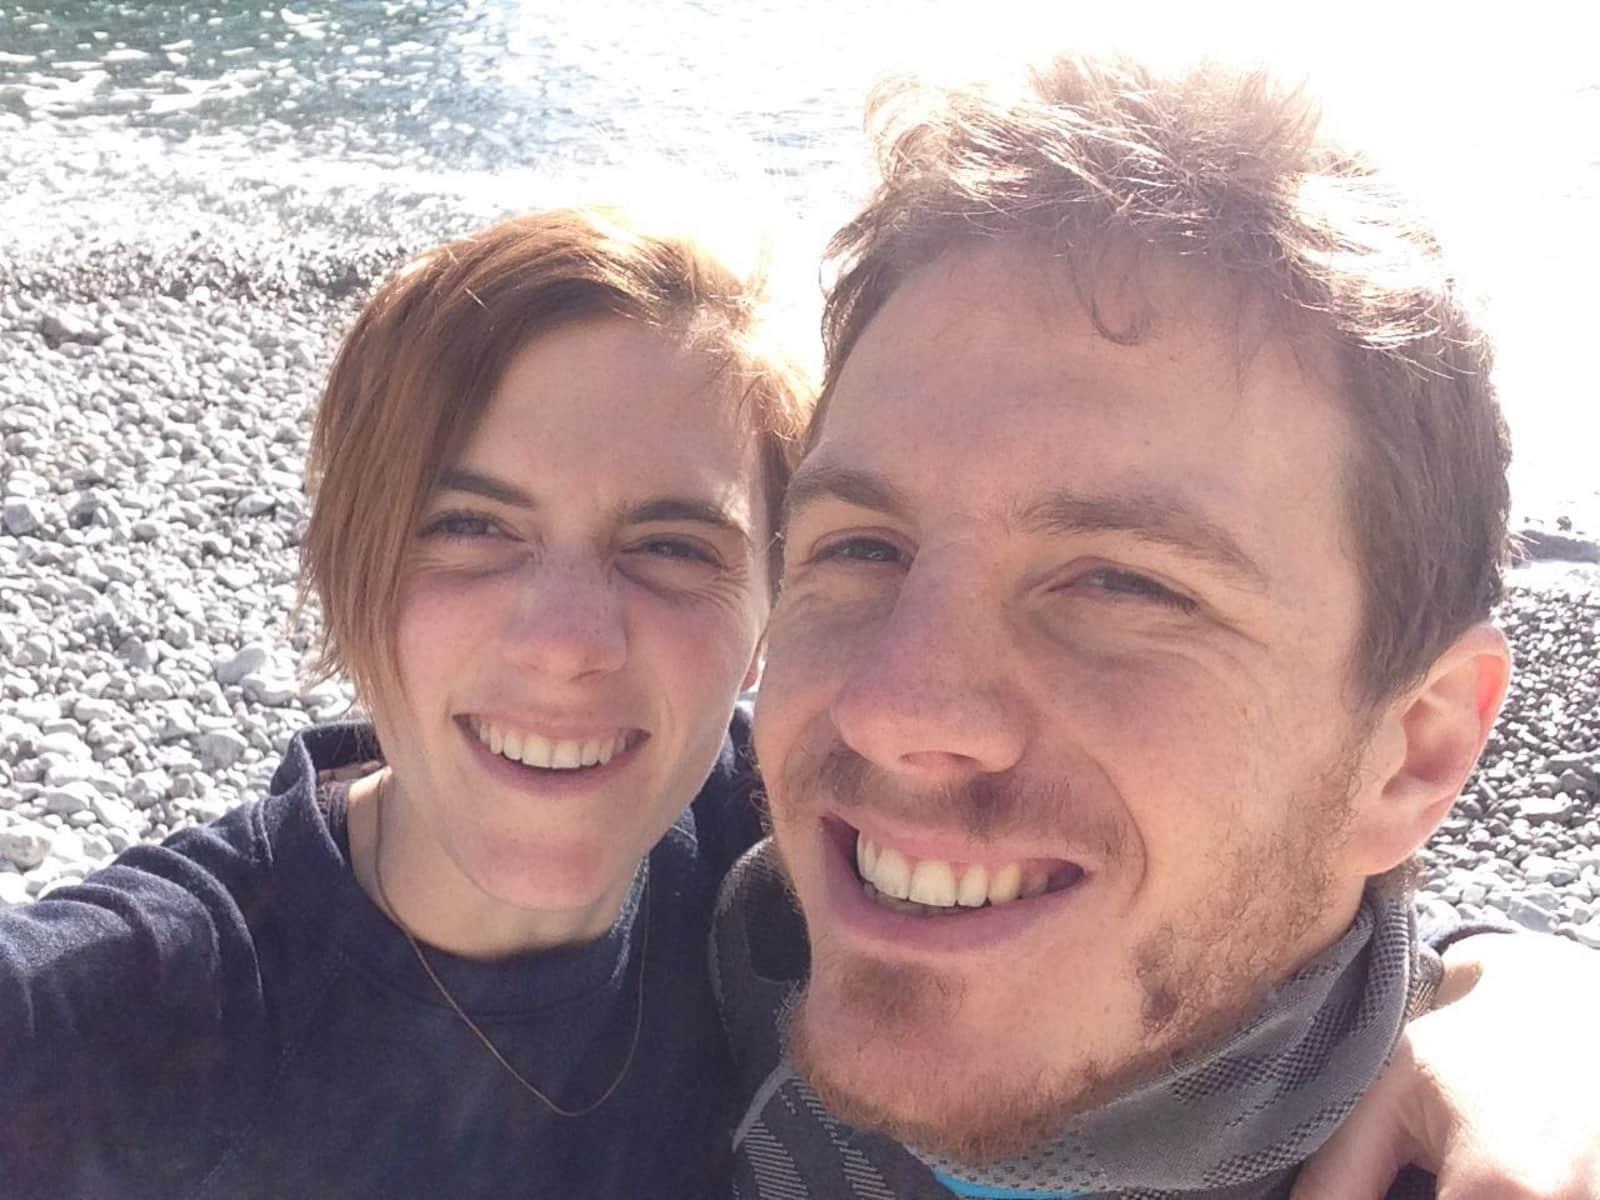 Lucie & mathieu & Mathieu from Bairnsdale, Victoria, Australia